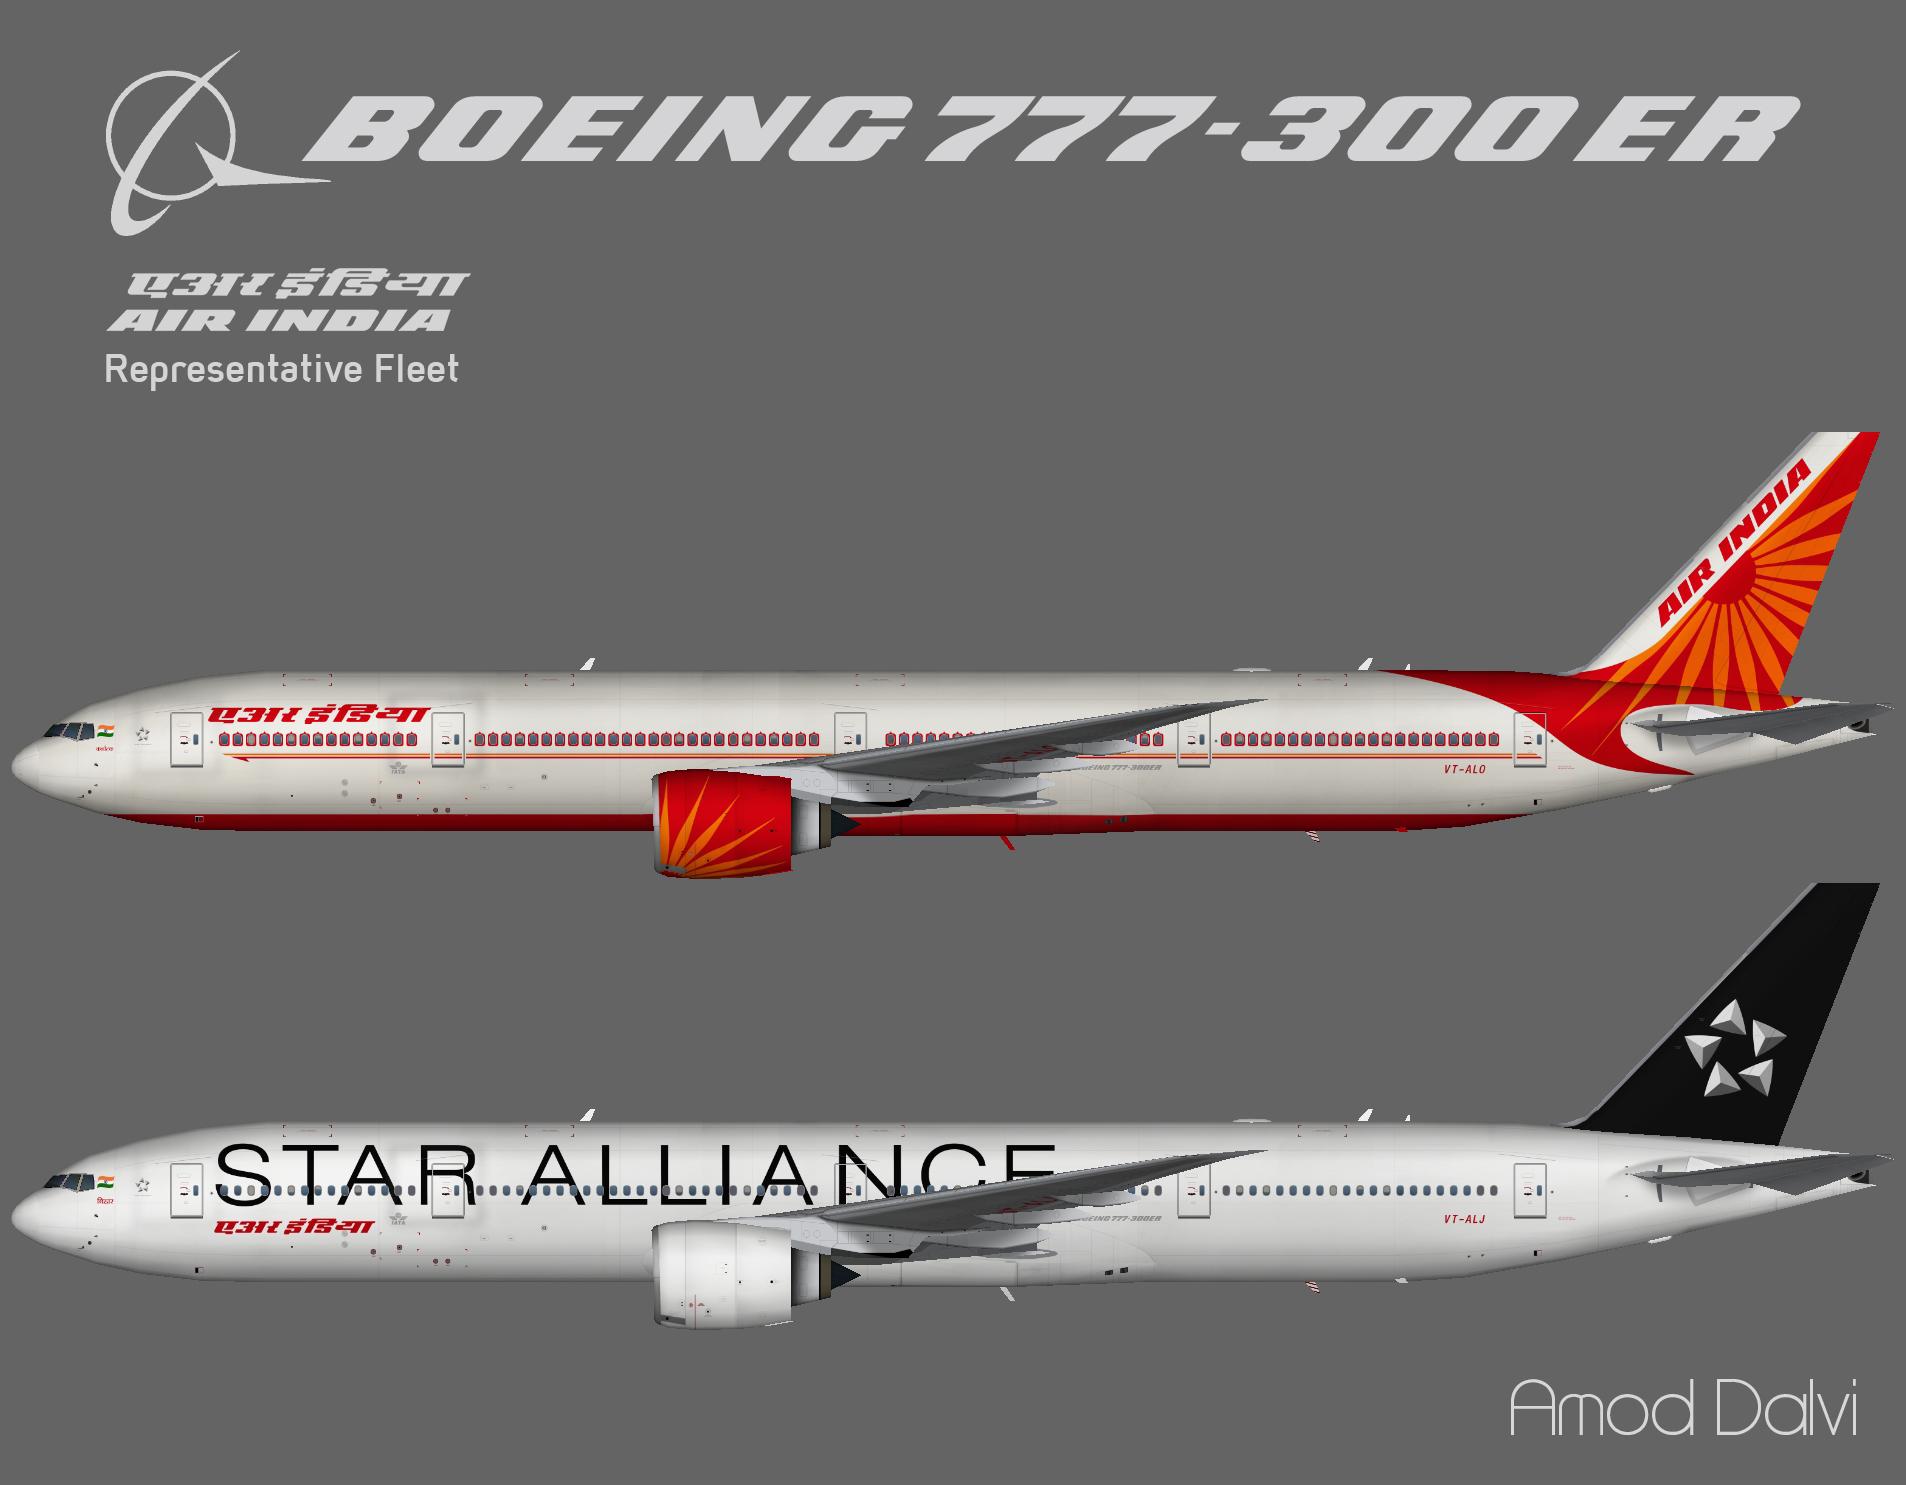 Air India Boeing 777-300ER – Amod